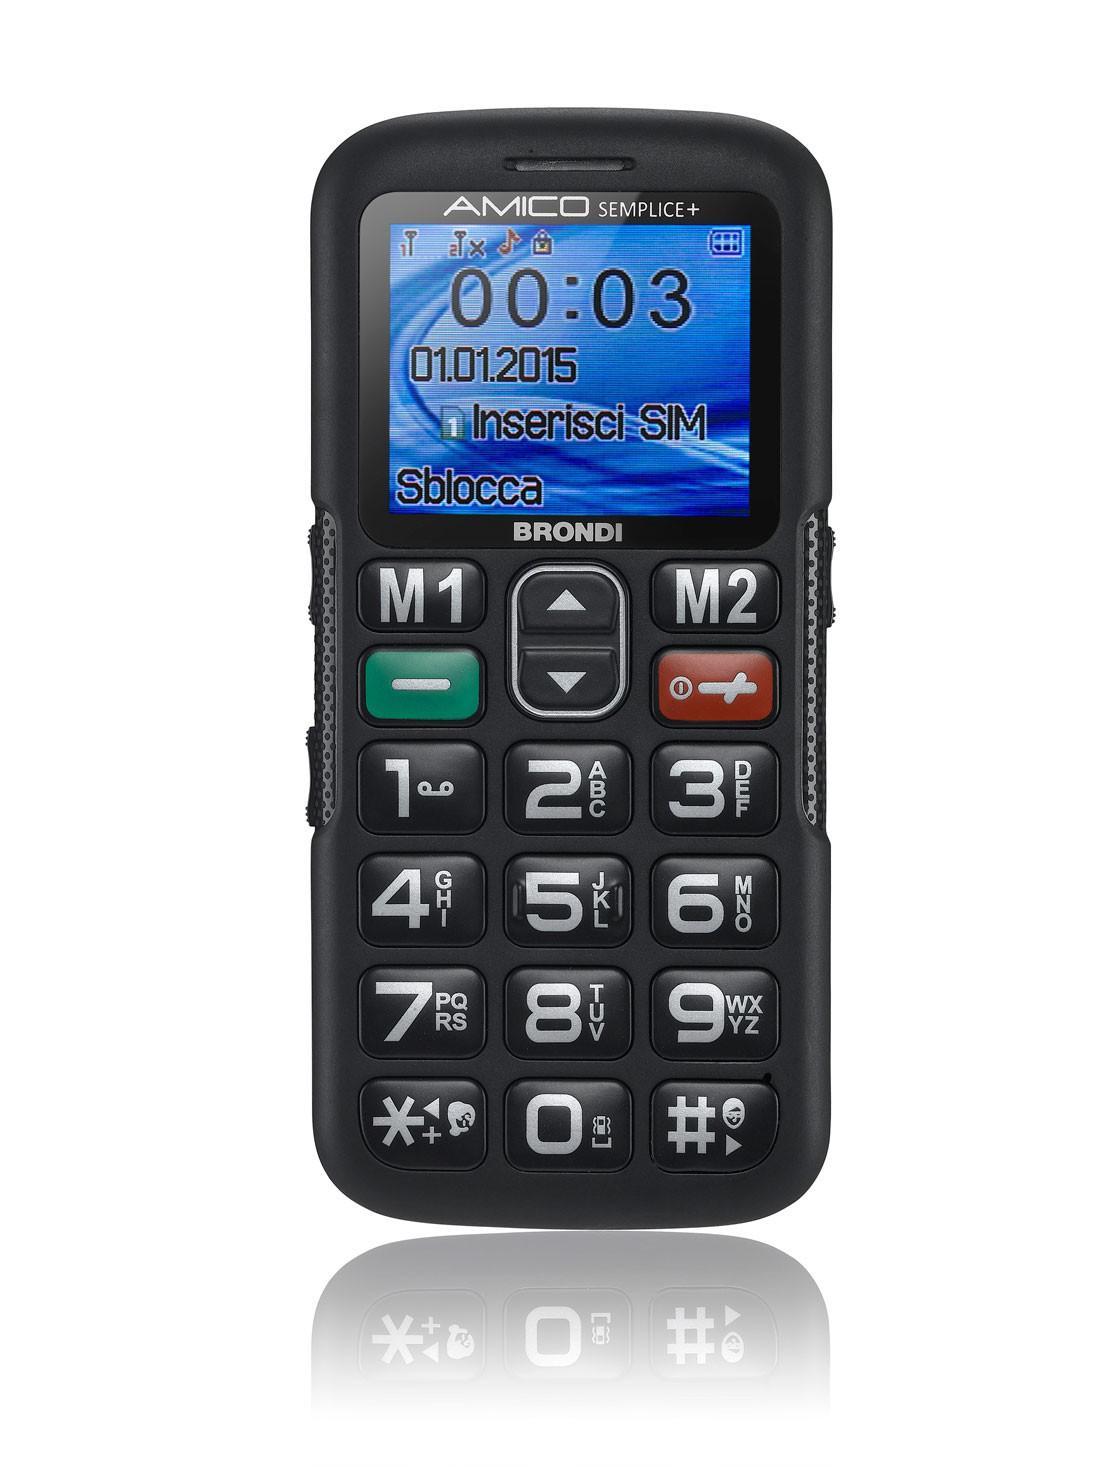 Amico SEMPLICE - - GSM